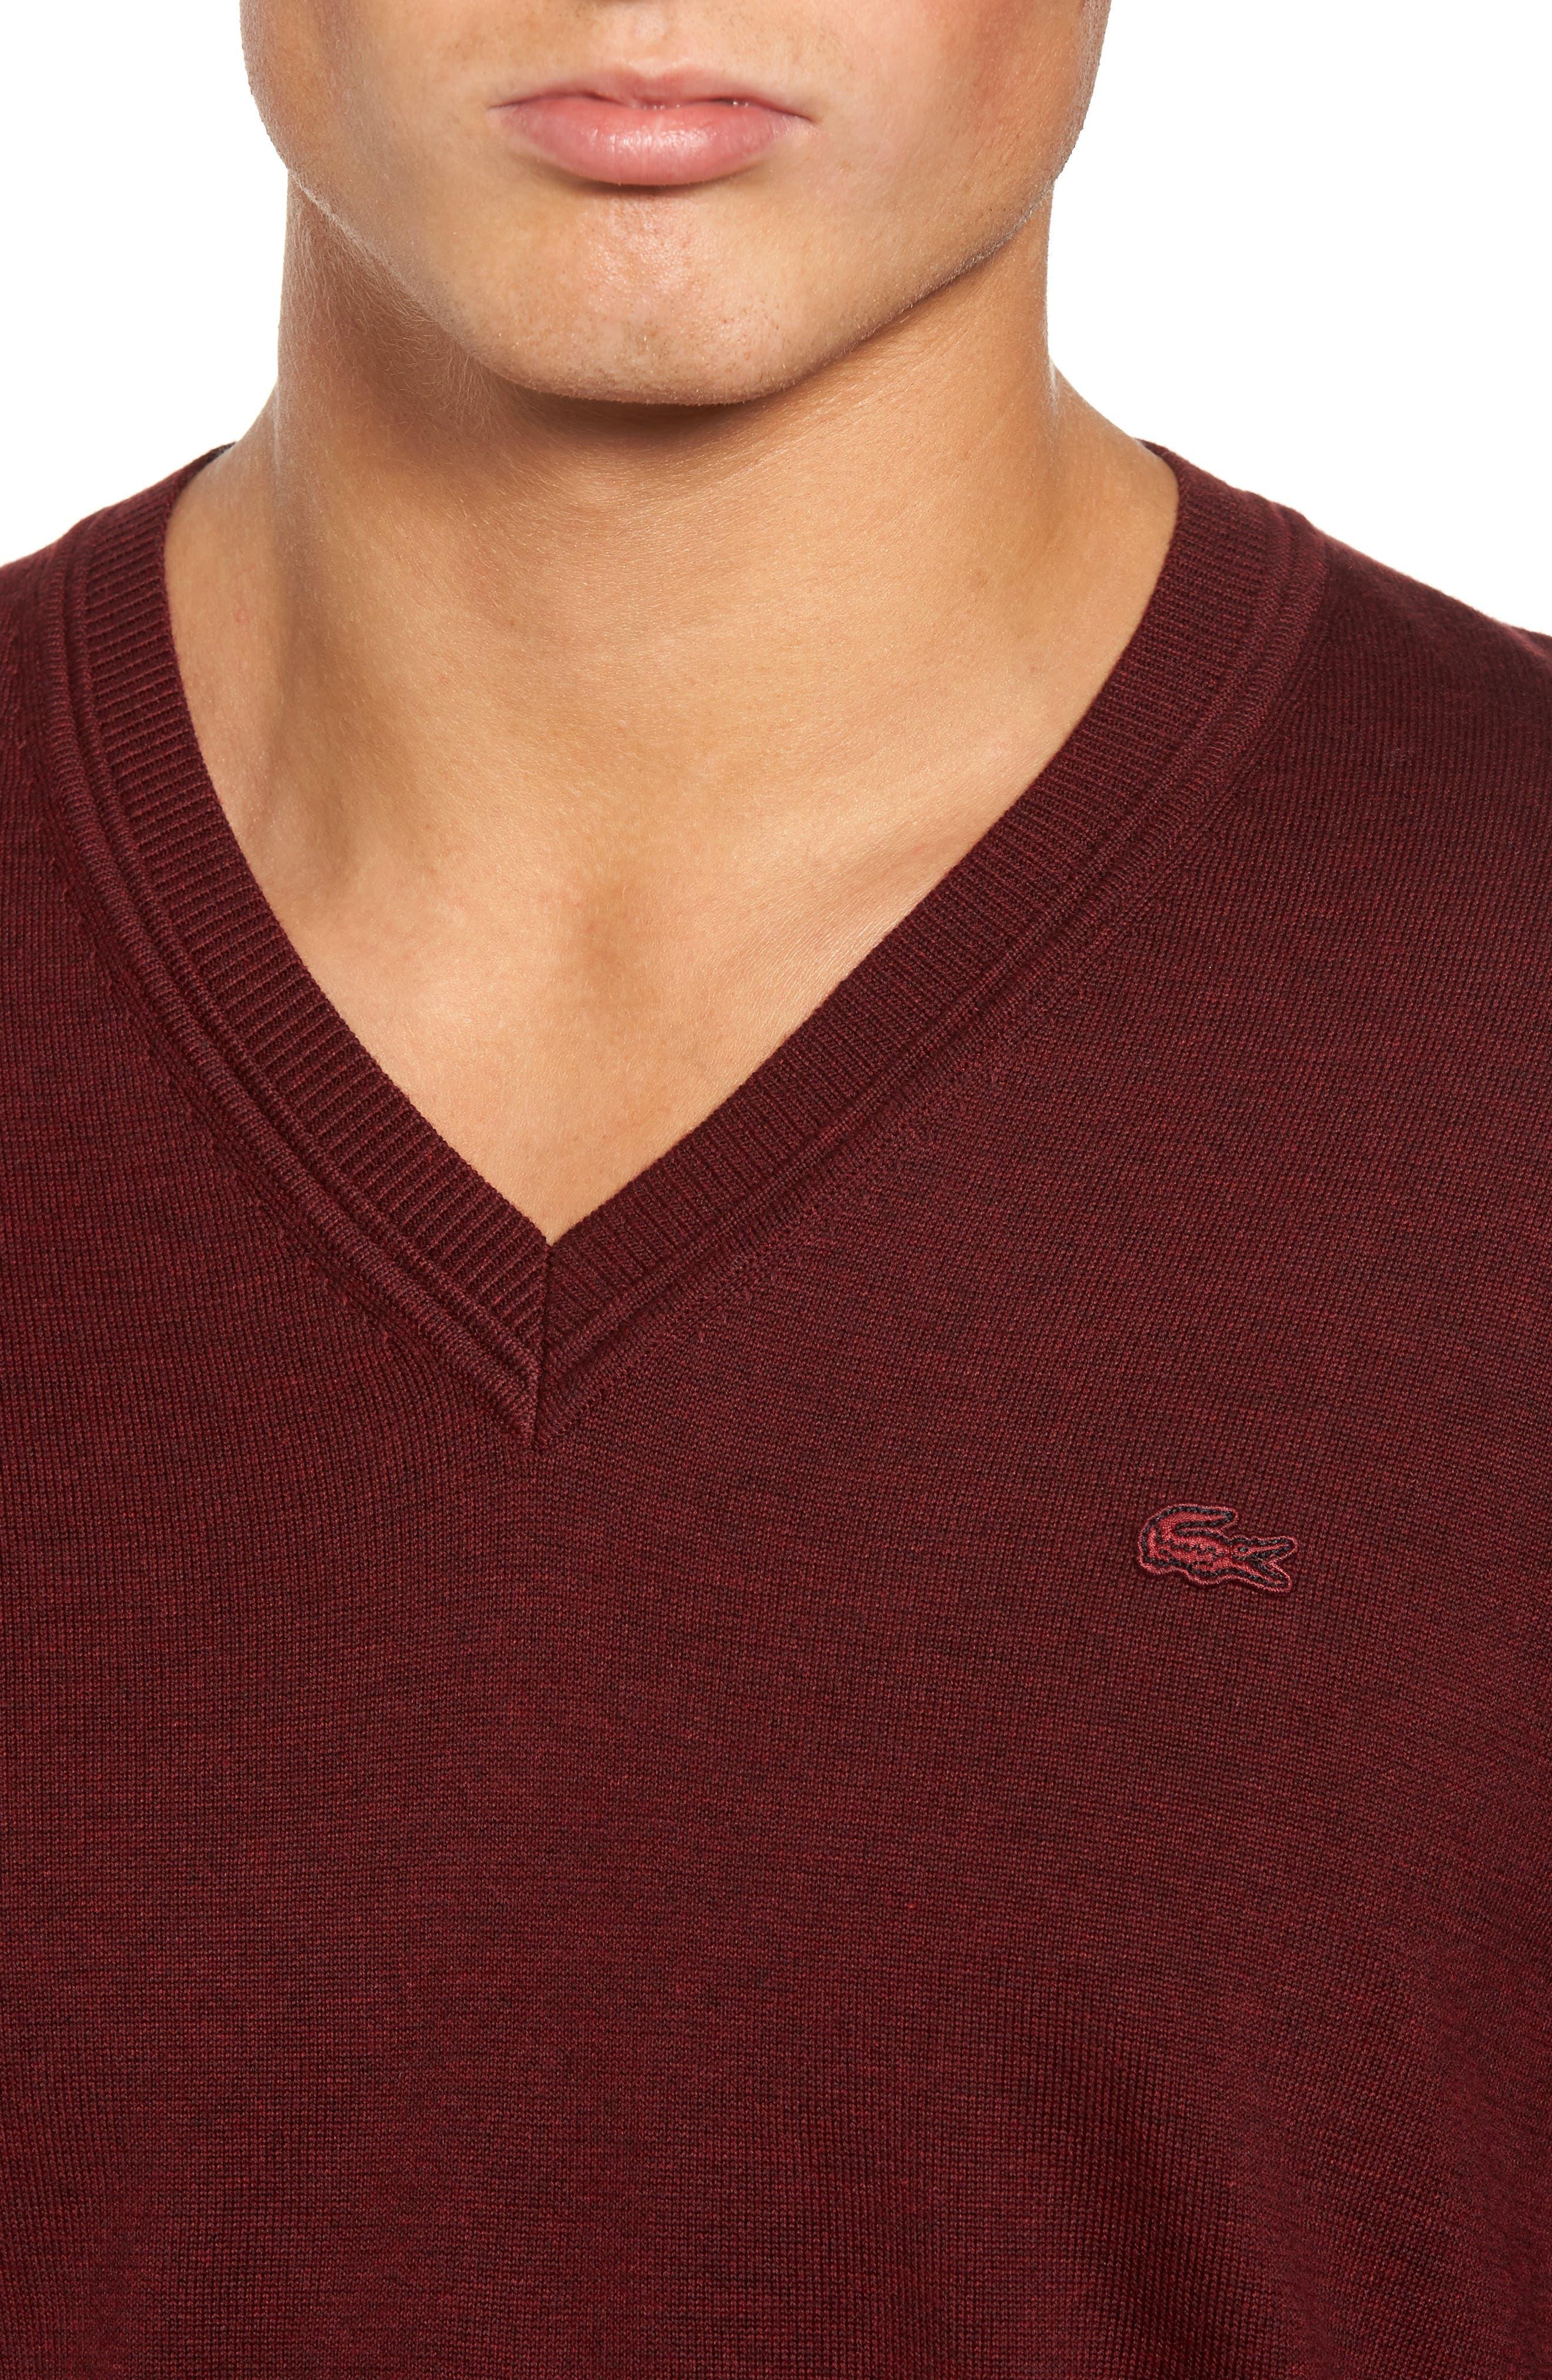 Cotton Jersey V-Neck Sweater,                             Alternate thumbnail 20, color,